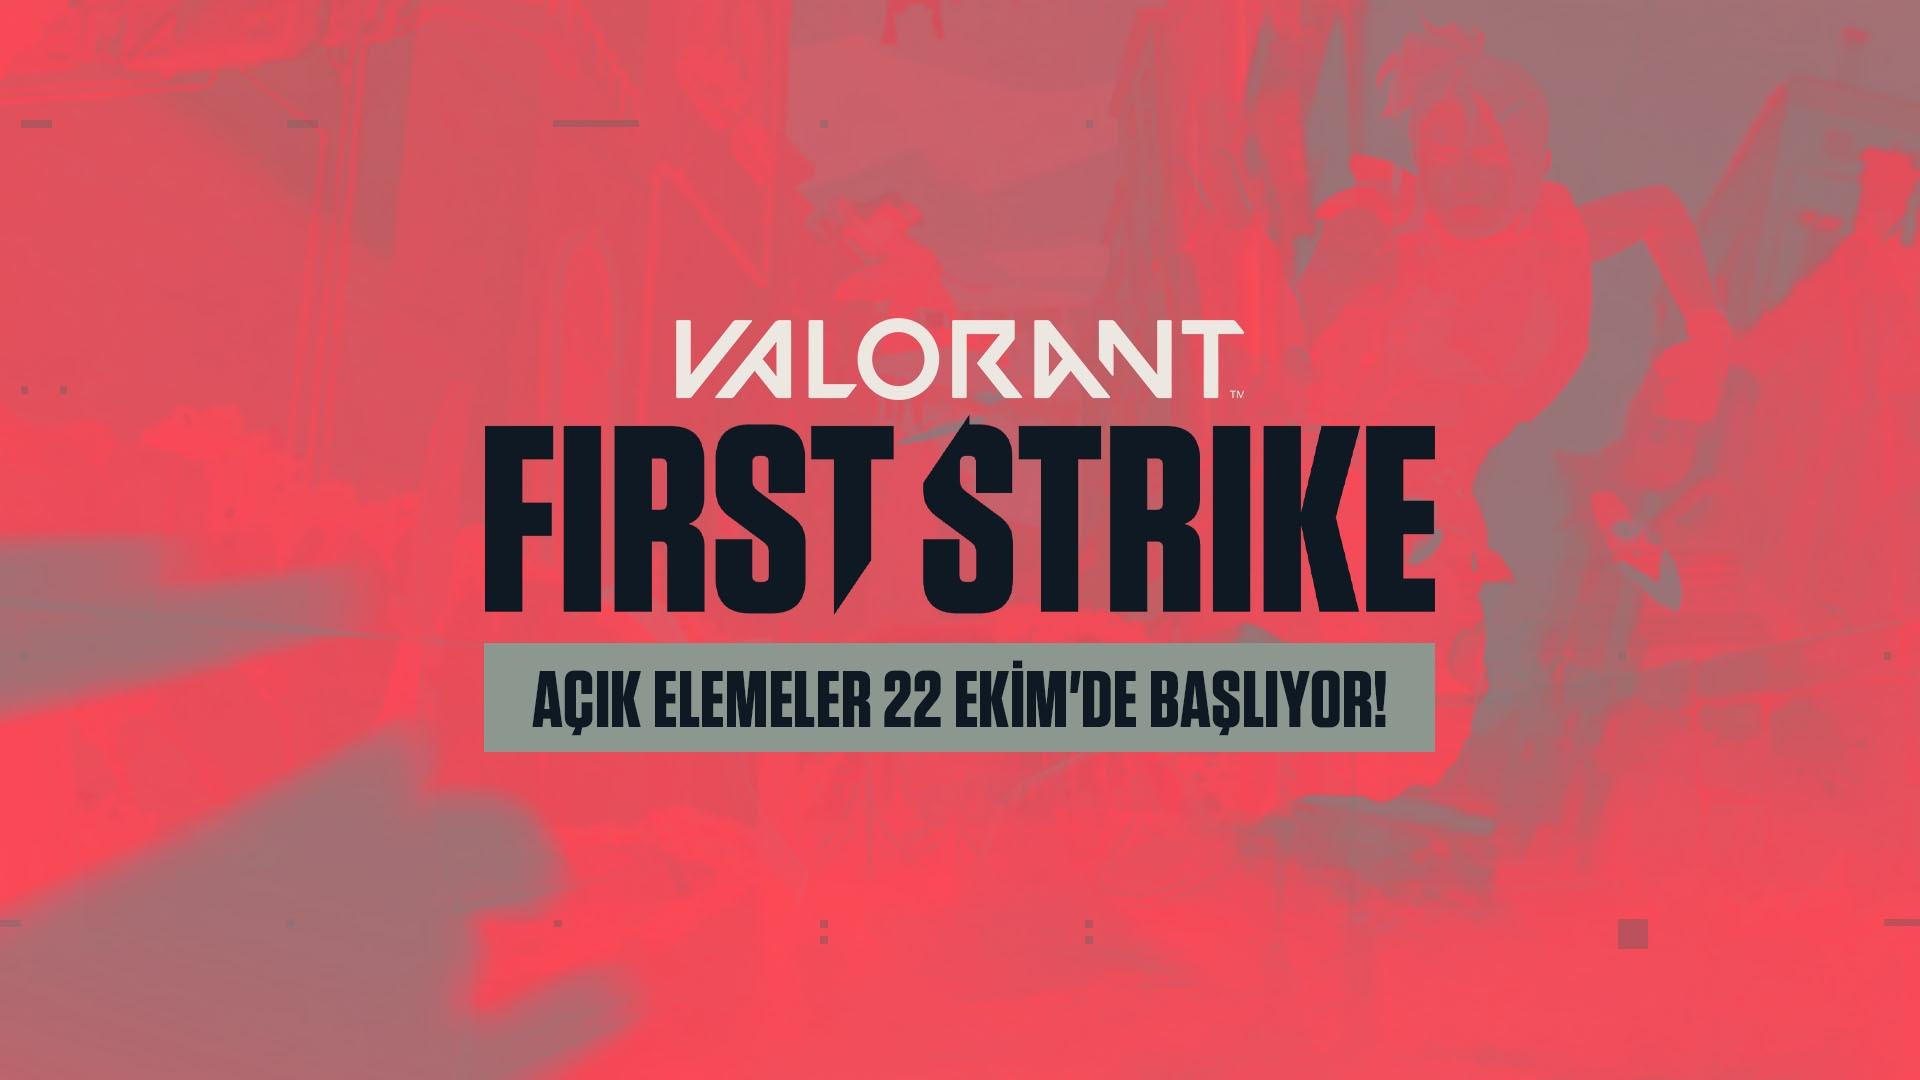 First_Strike_Duyuru_(1).jpg